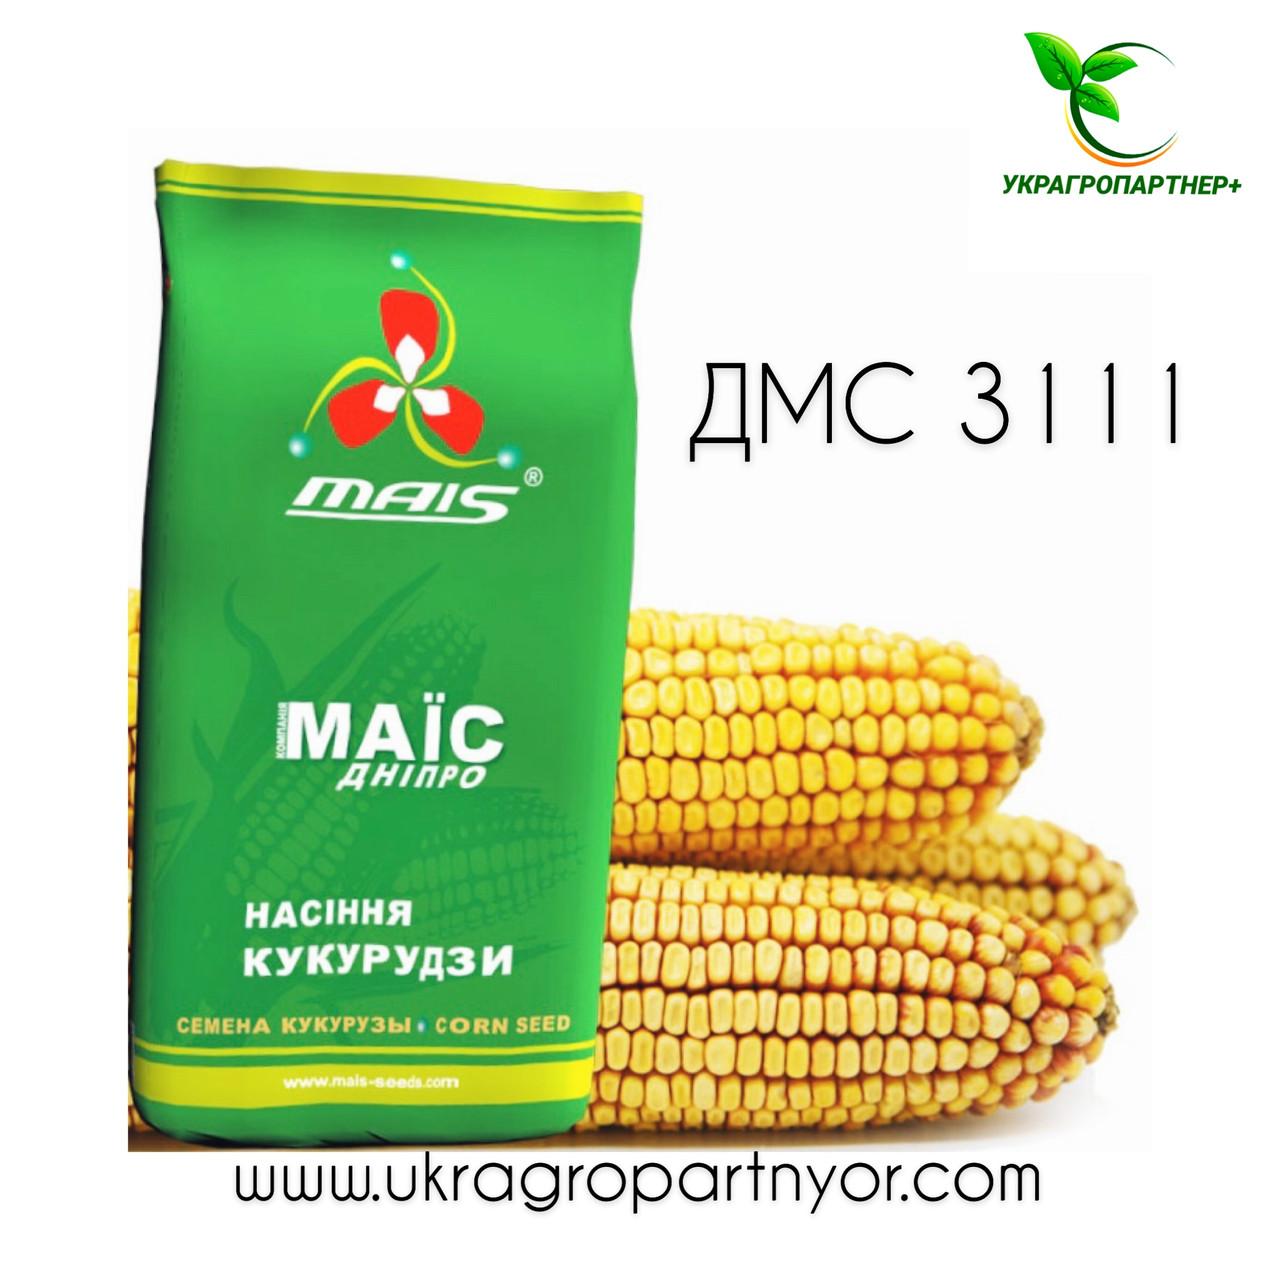 КУКУРУДЗА ДМС 3111 (ФАО - 310) 2020 р. в. (МАЇС Синельн)